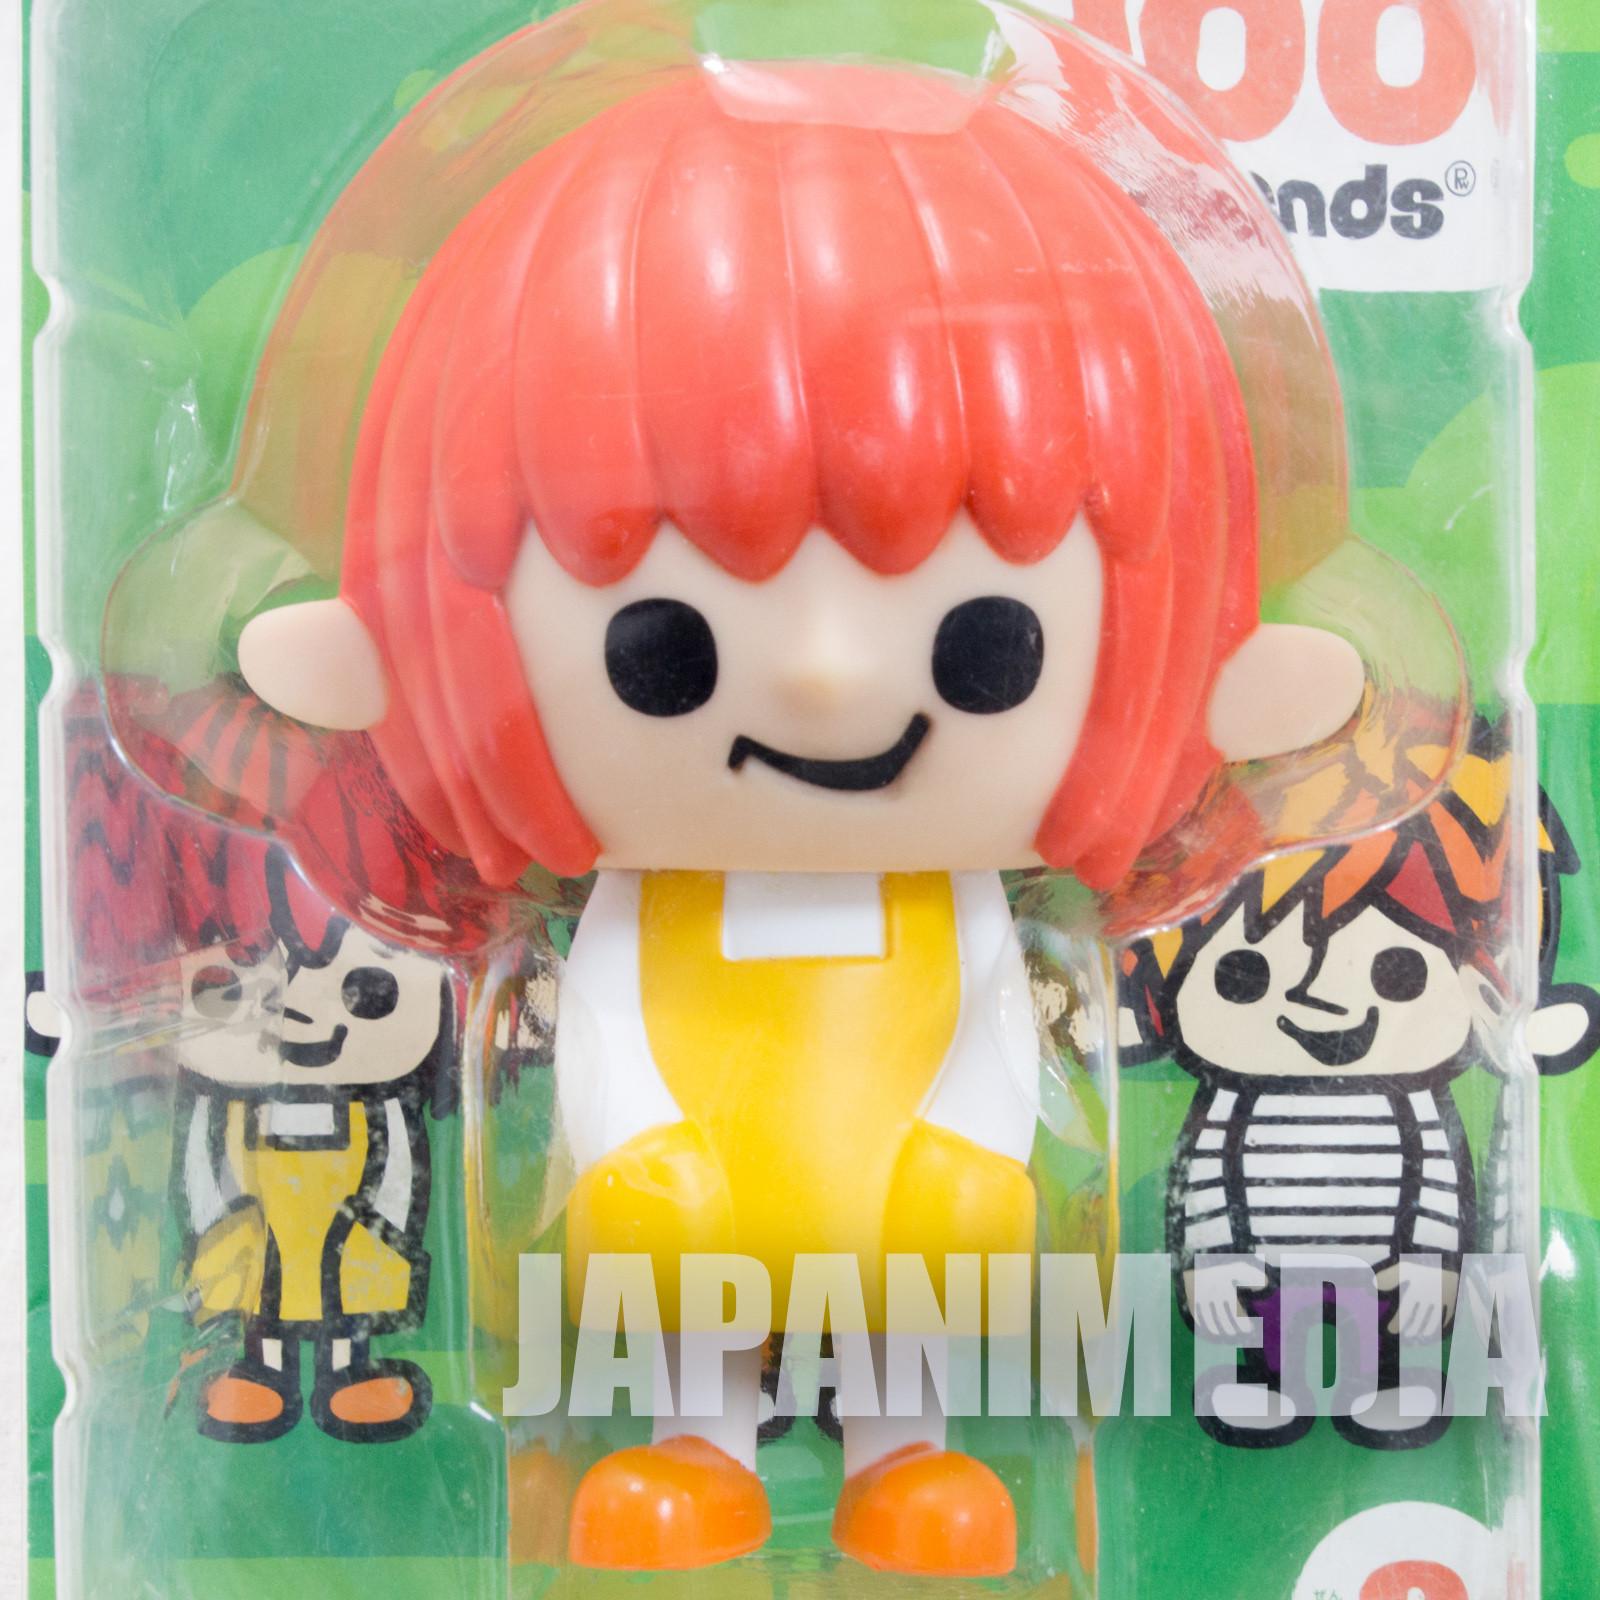 RARE! Robin with his 100 friends Belle Soft Vinyl Figure Series PansonWorks JAPAN